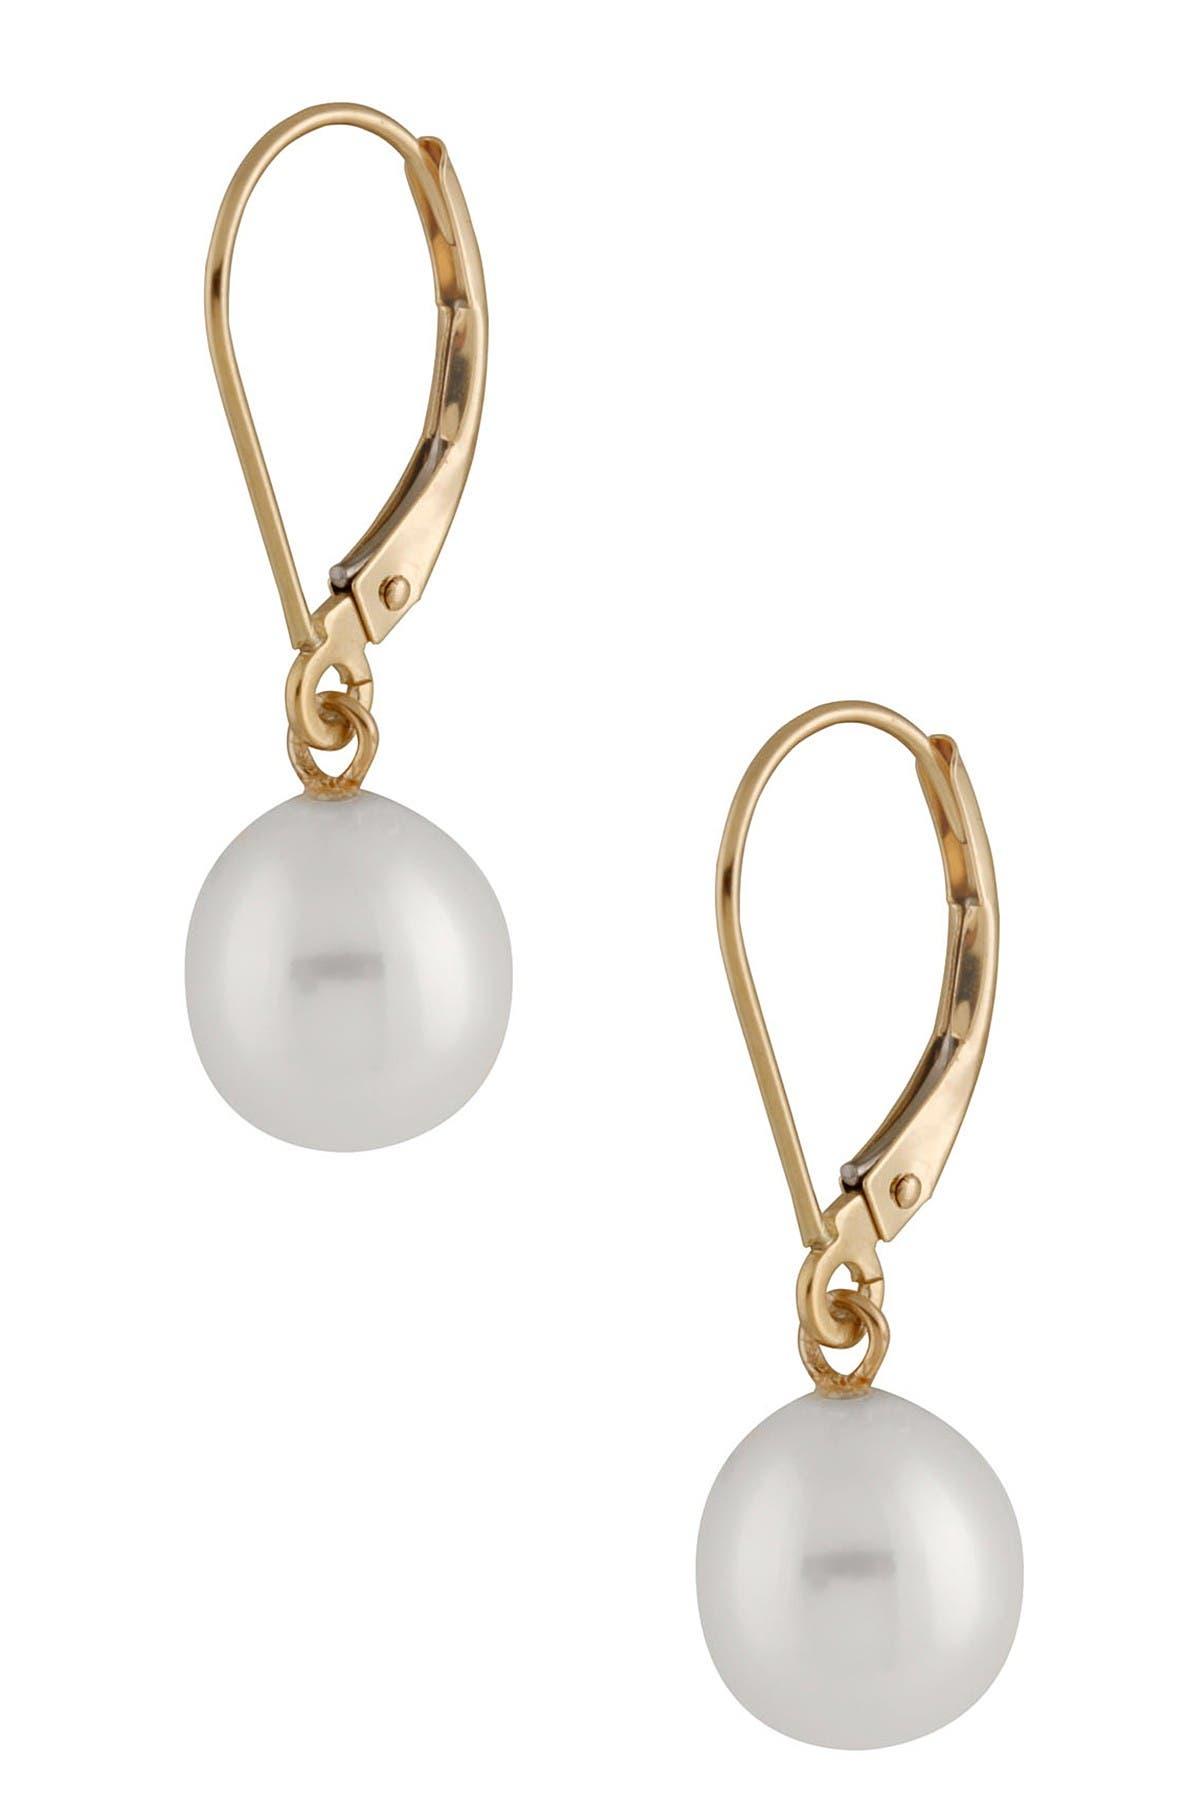 Image of Splendid Pearls 14K Gold 7-7.5mm White Freshwater Pearl Leverback Earrings